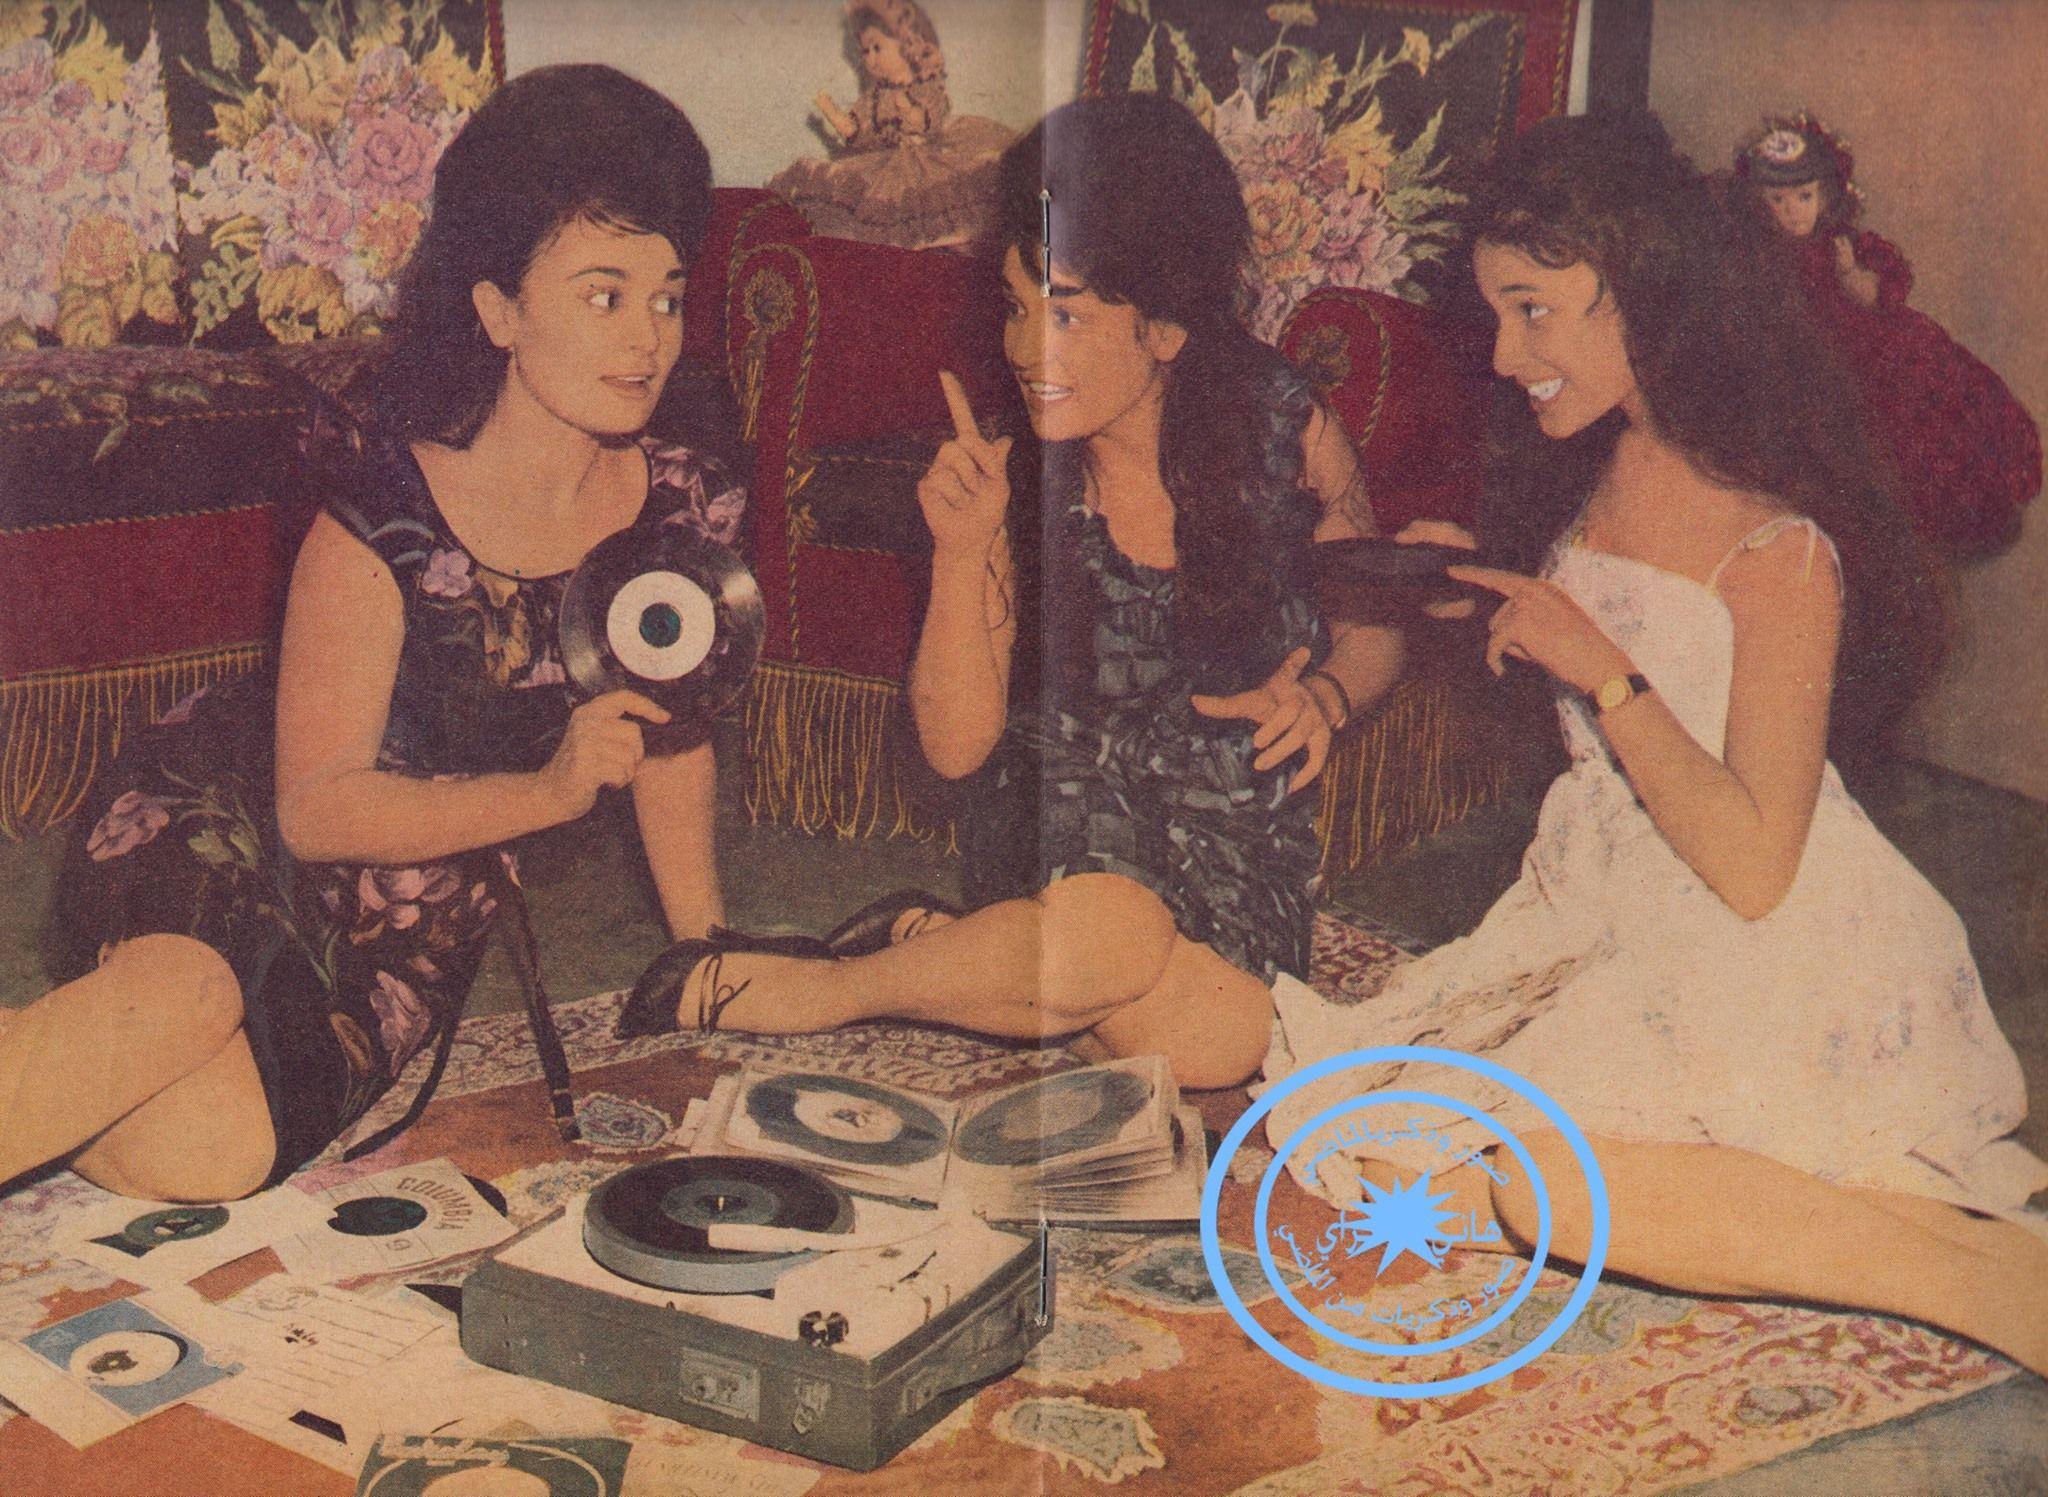 نيللي و فيروز و لبلبة Arab Celebrities Persian Fashion History